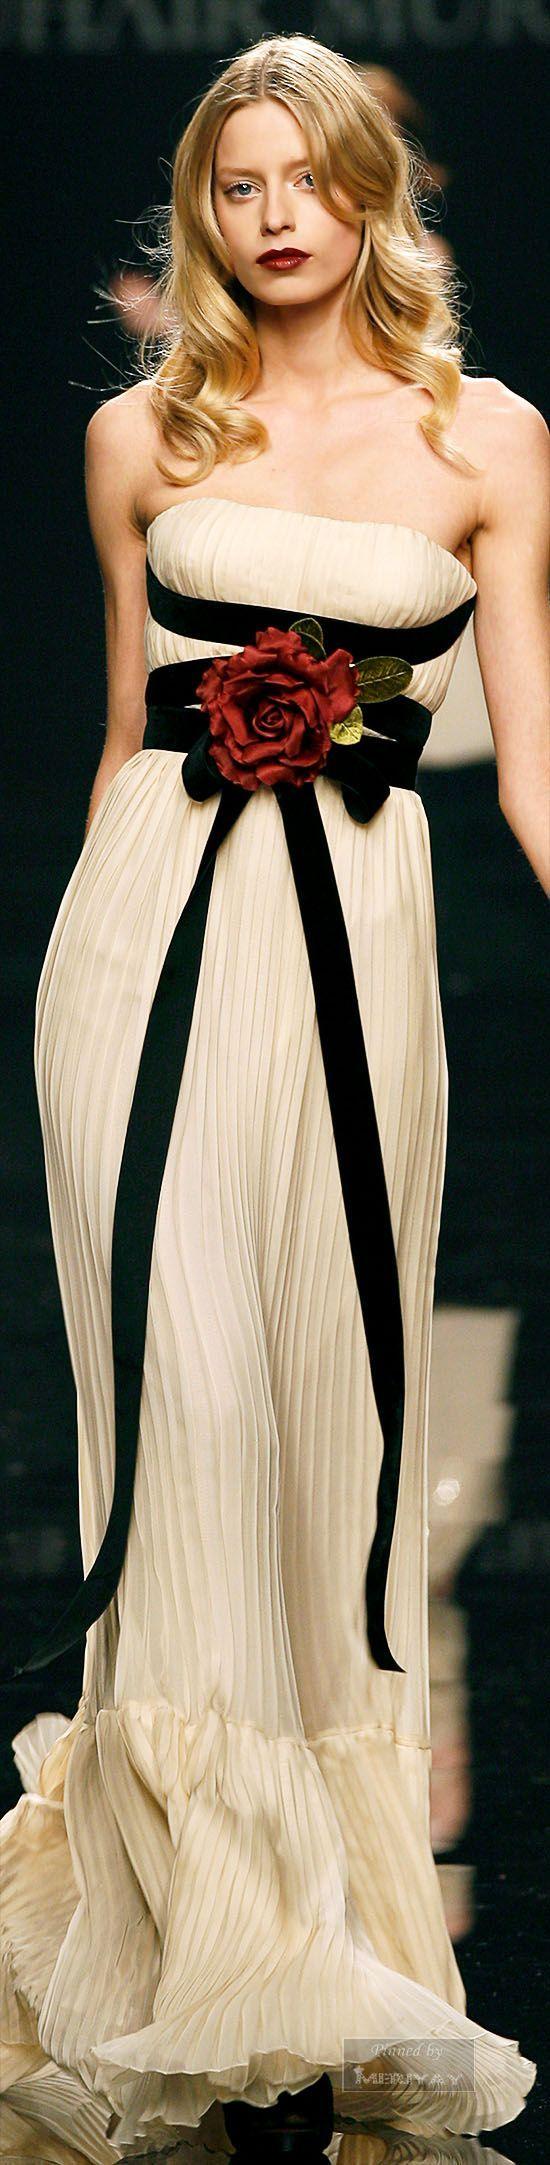 Zuhair Murad ~ Strapless Evening Gown, Beige